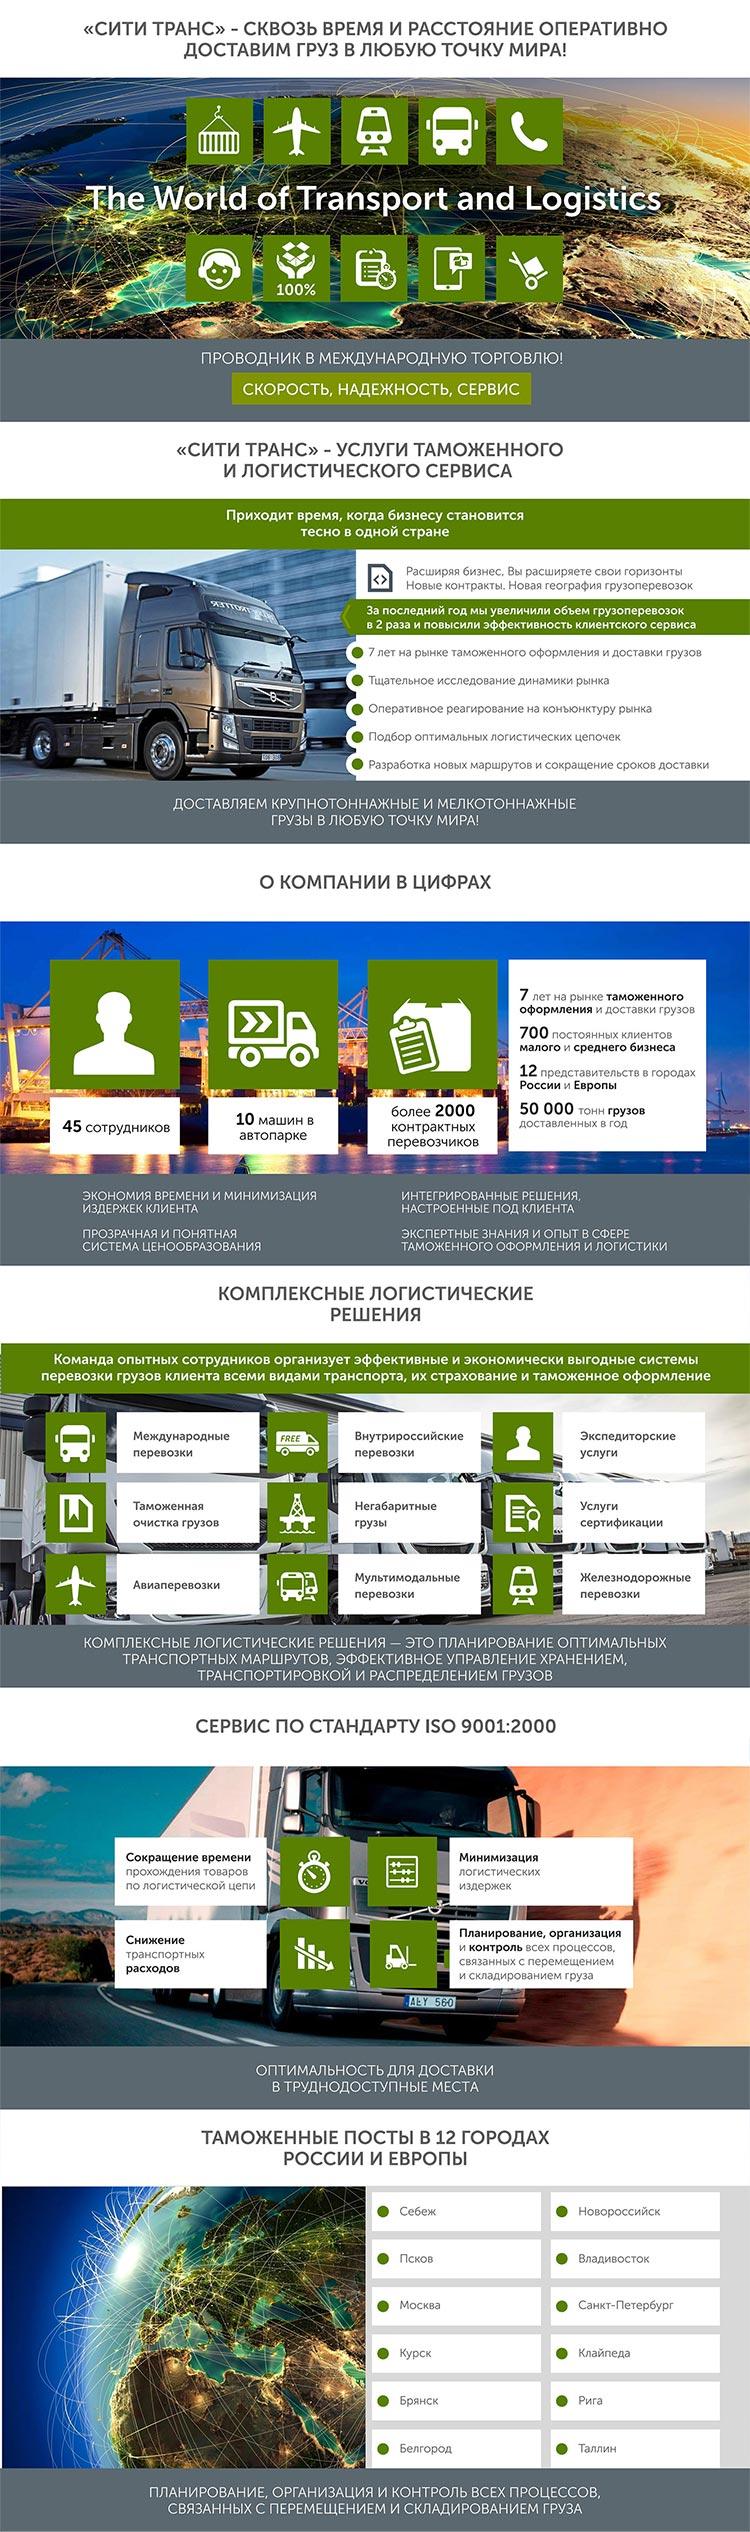 zakazat-prezentacija-transportnoj-logisticheskoj-kompanii